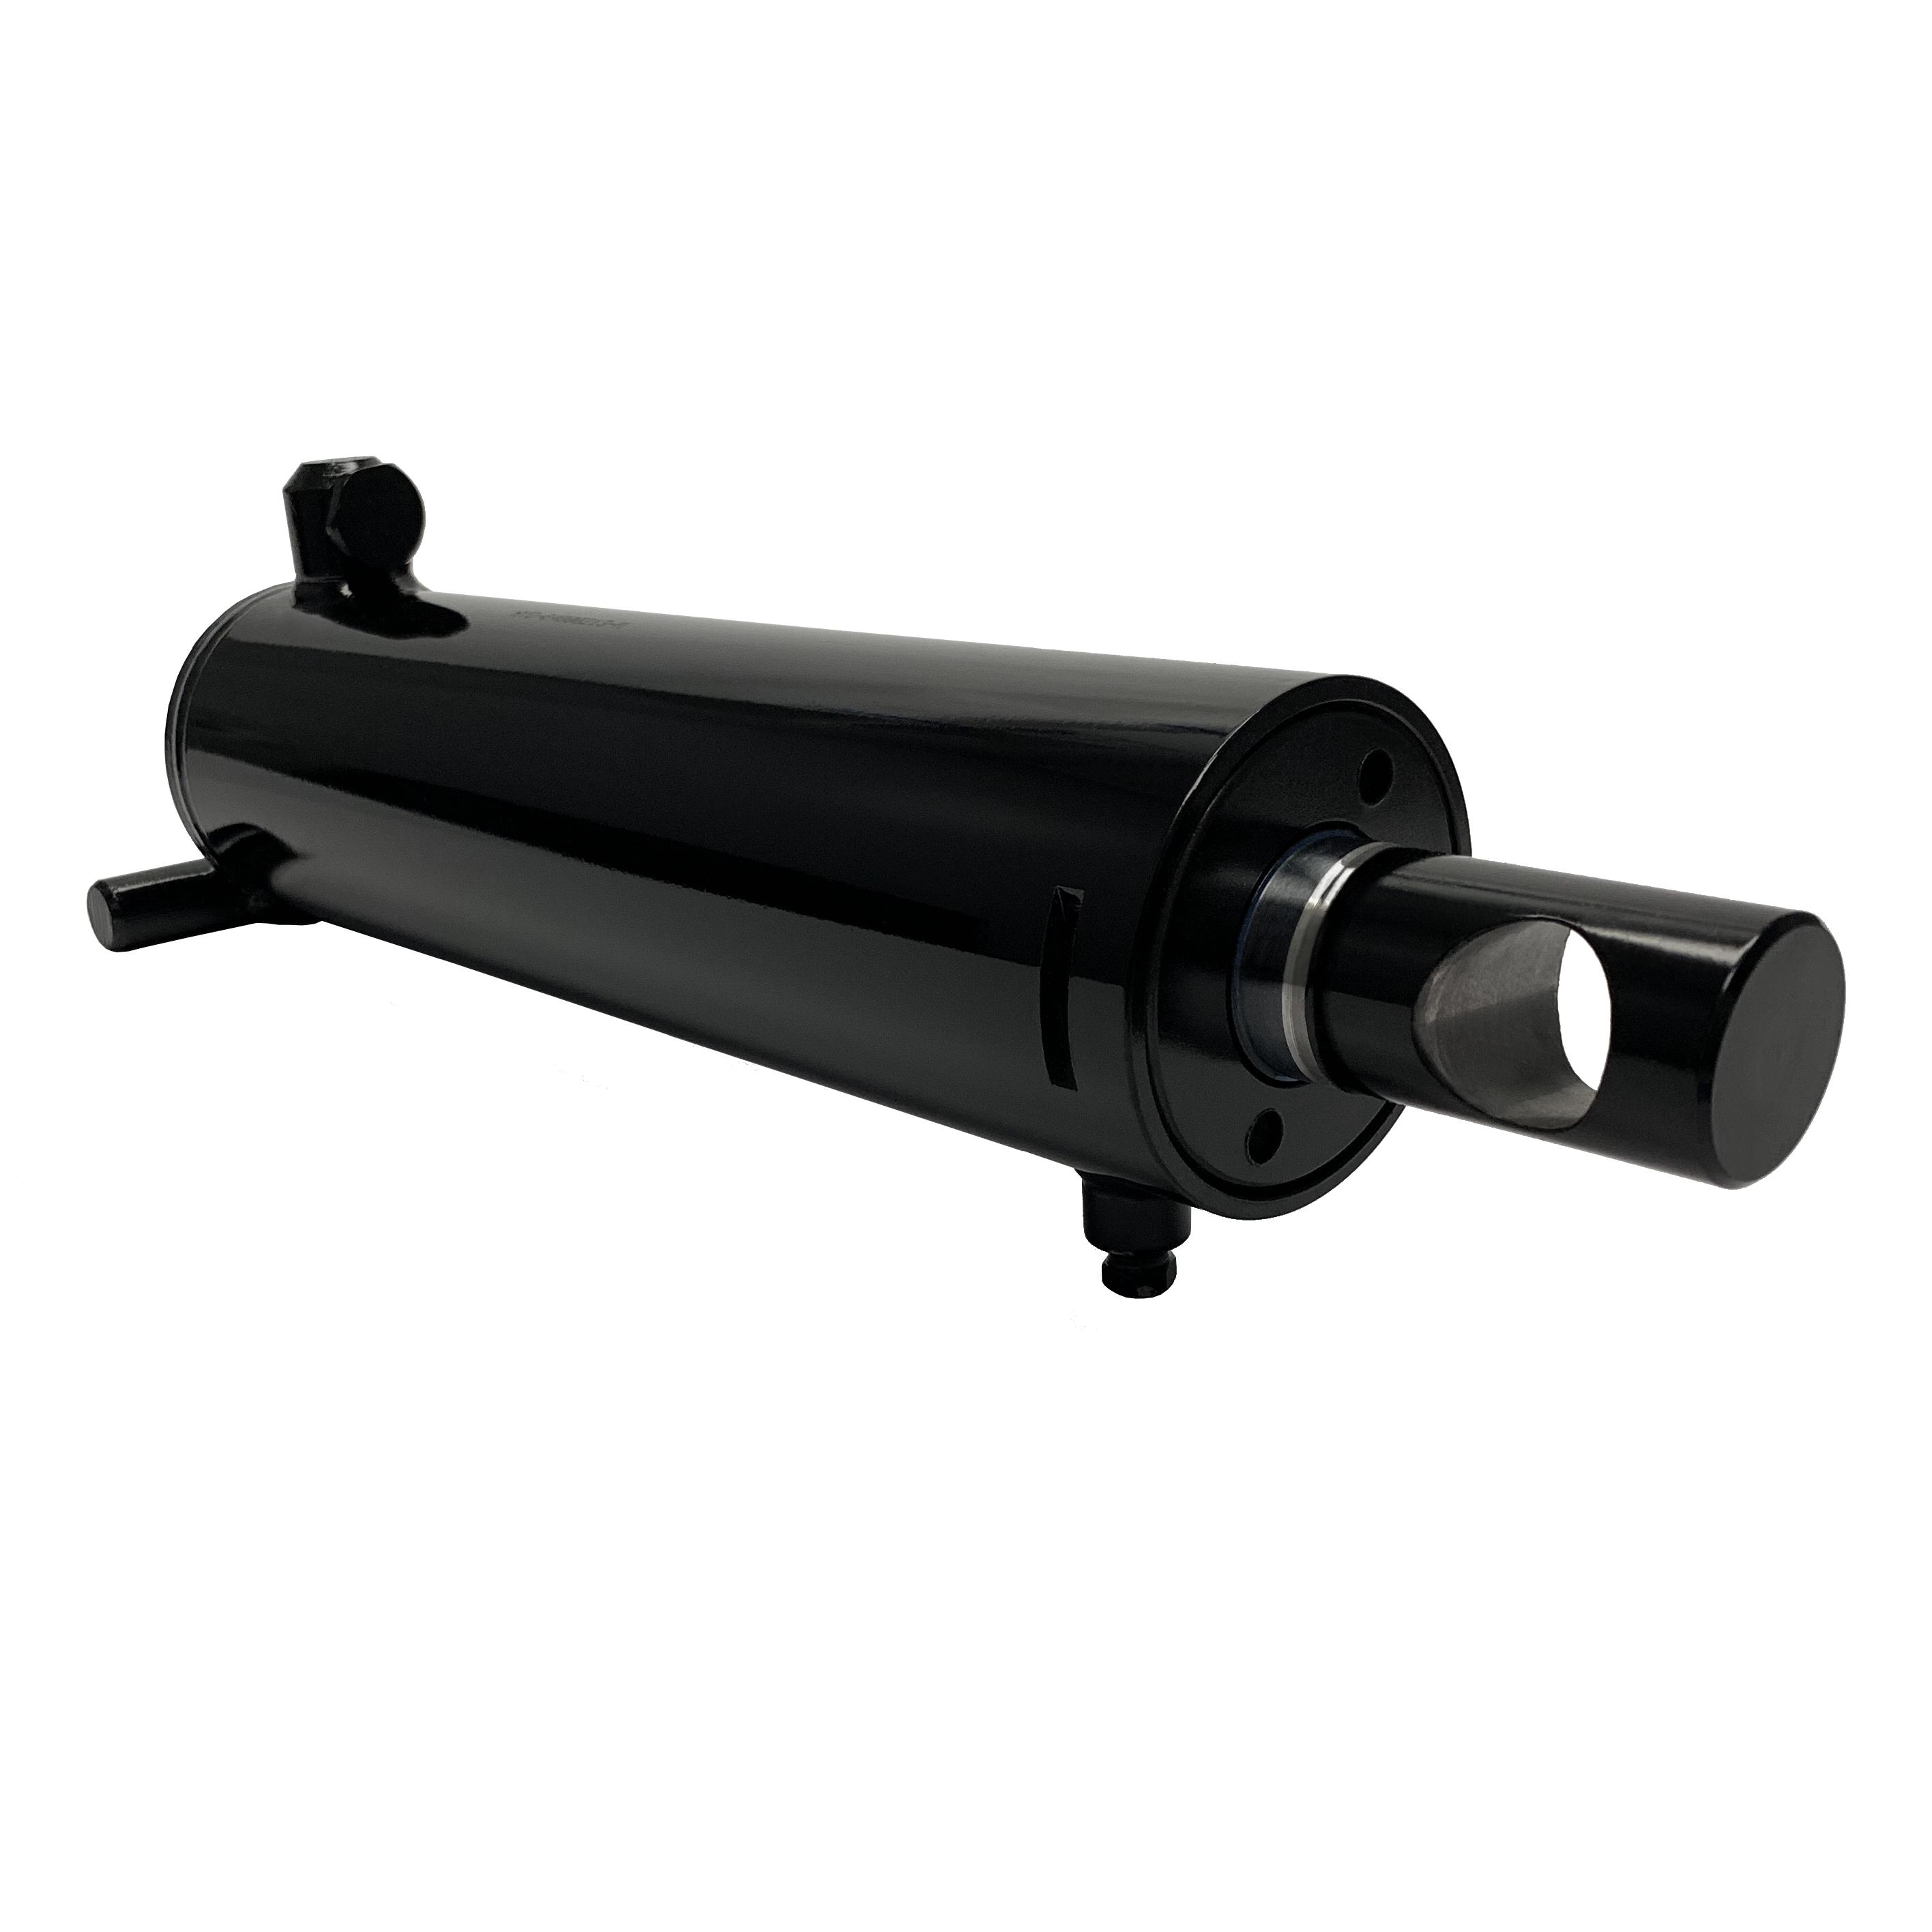 Bishamon Optimus Hydraulic Lift Table Cylinder Lift2k, Lift3k, Lift5k